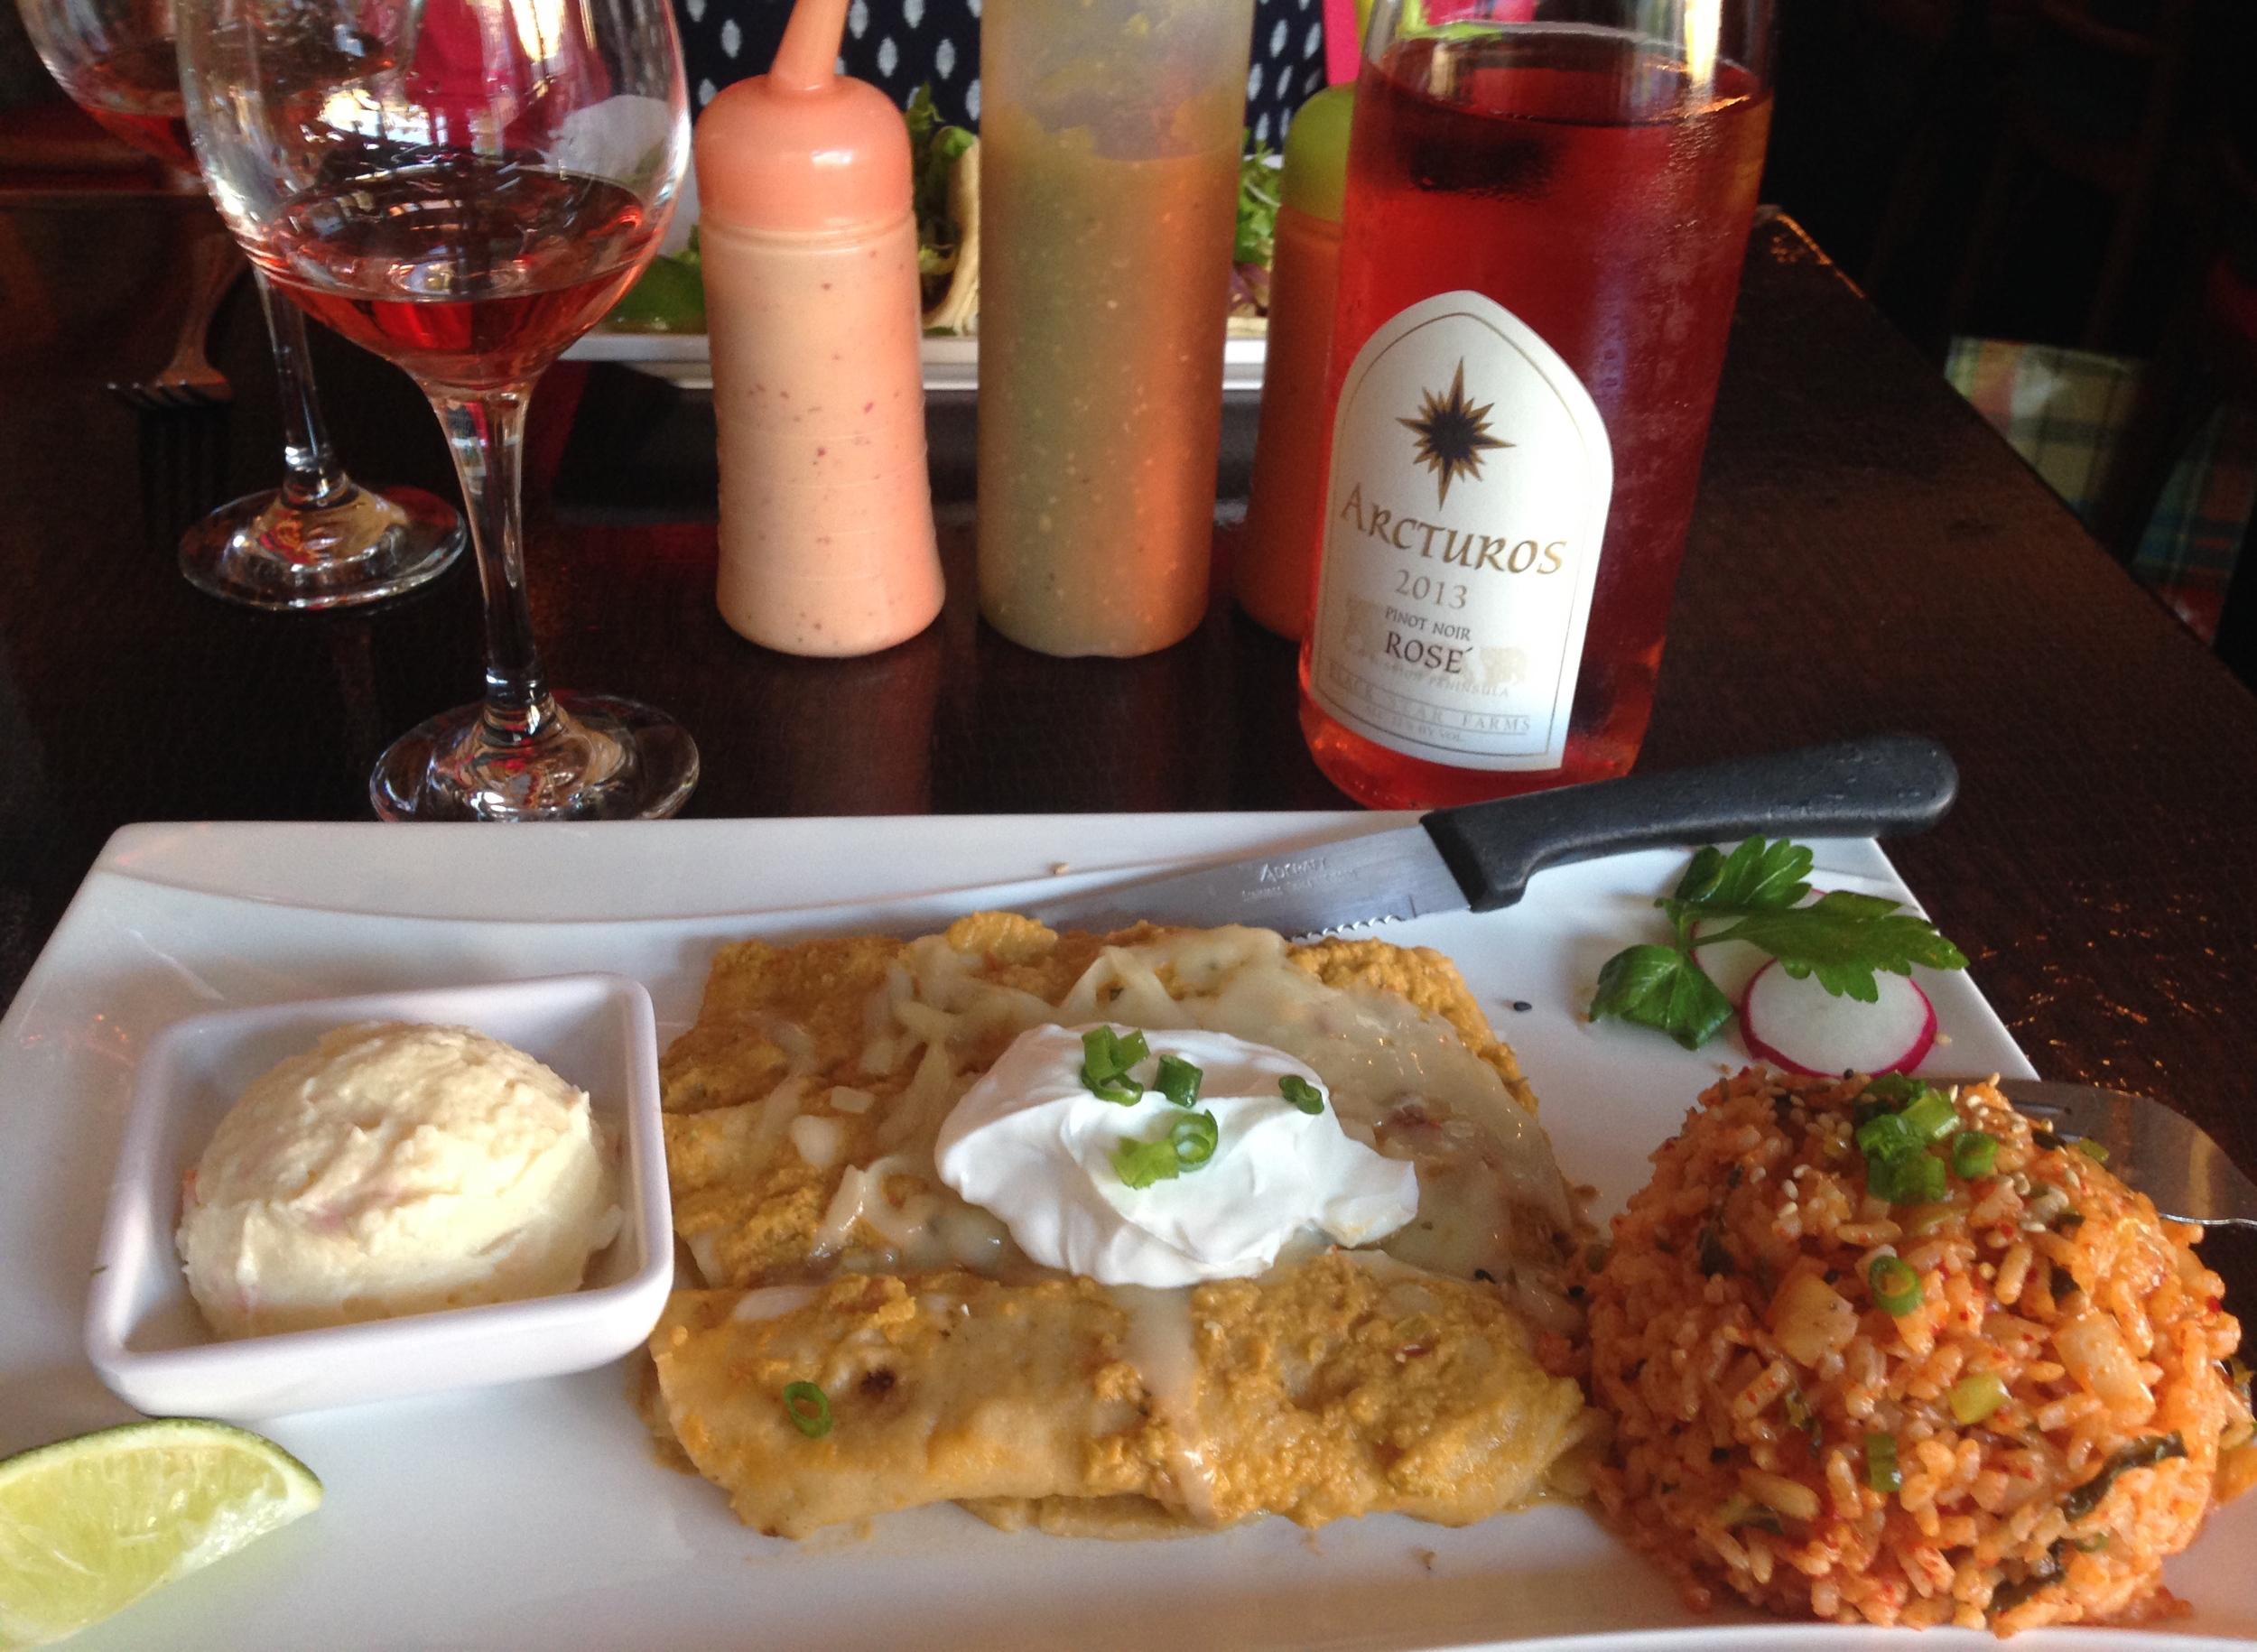 Our Arcturos Rosé back in Chicago, saddled up to some Korean enchiladas!